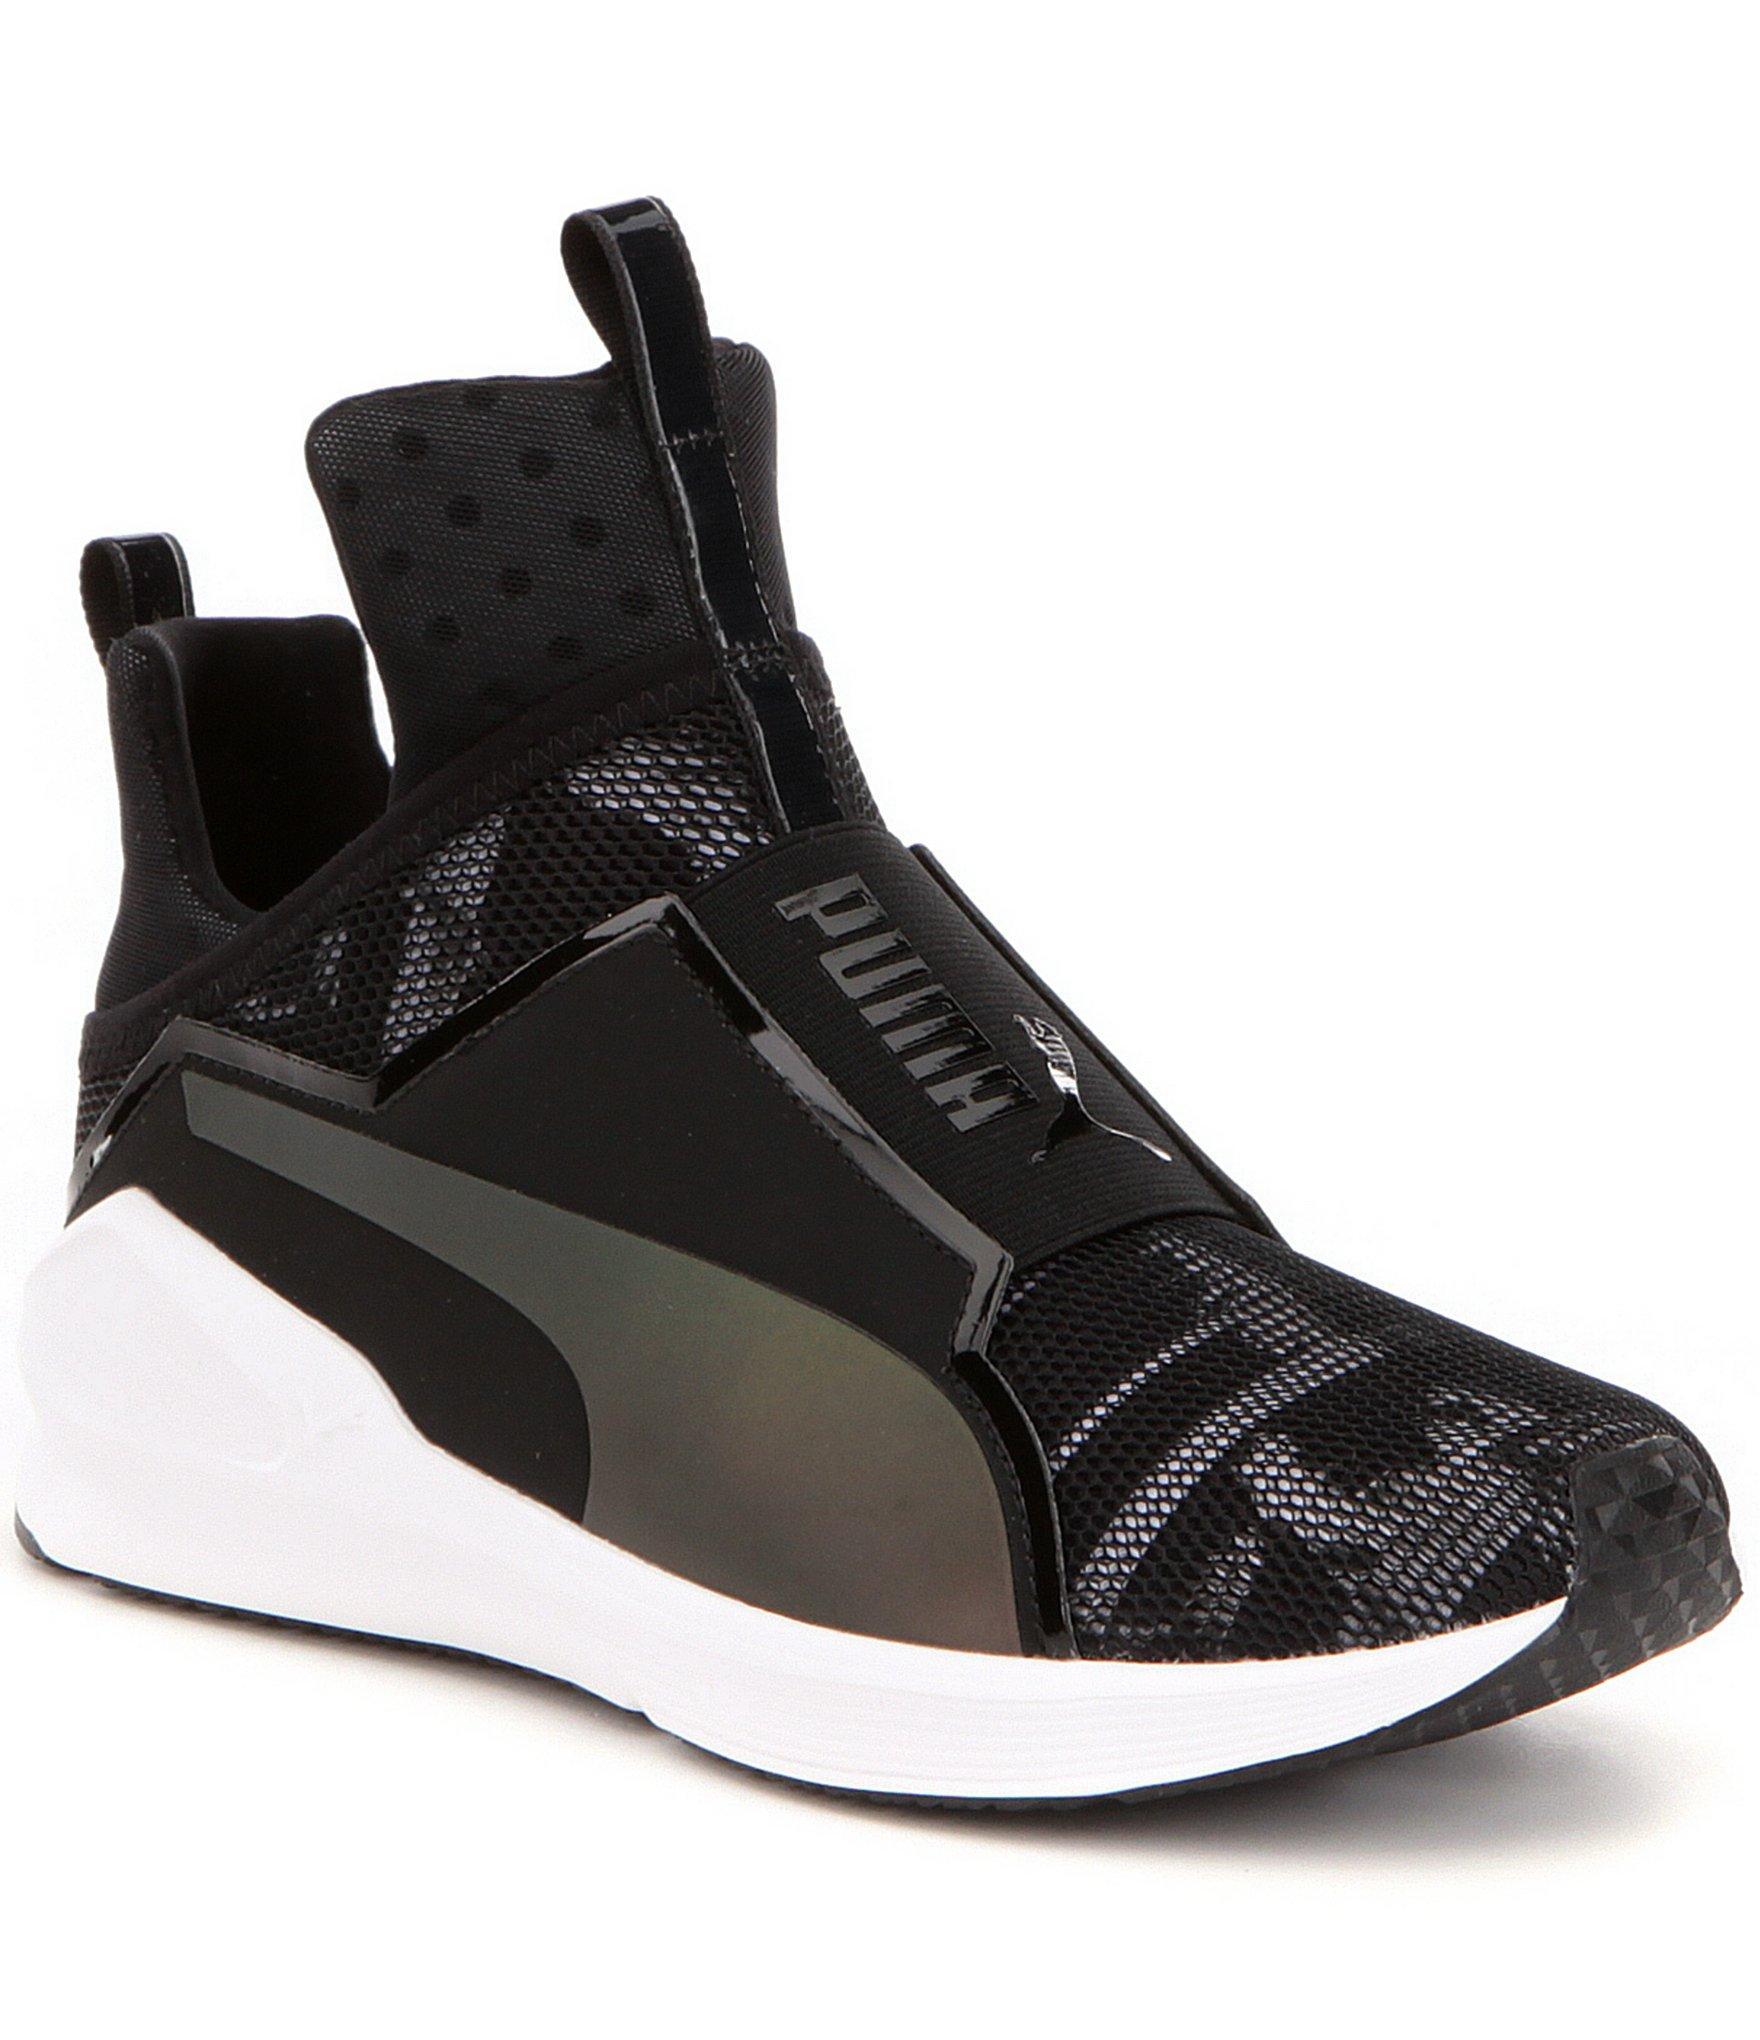 506730571-Puma Black-Puma White-beb80293-.jpeg